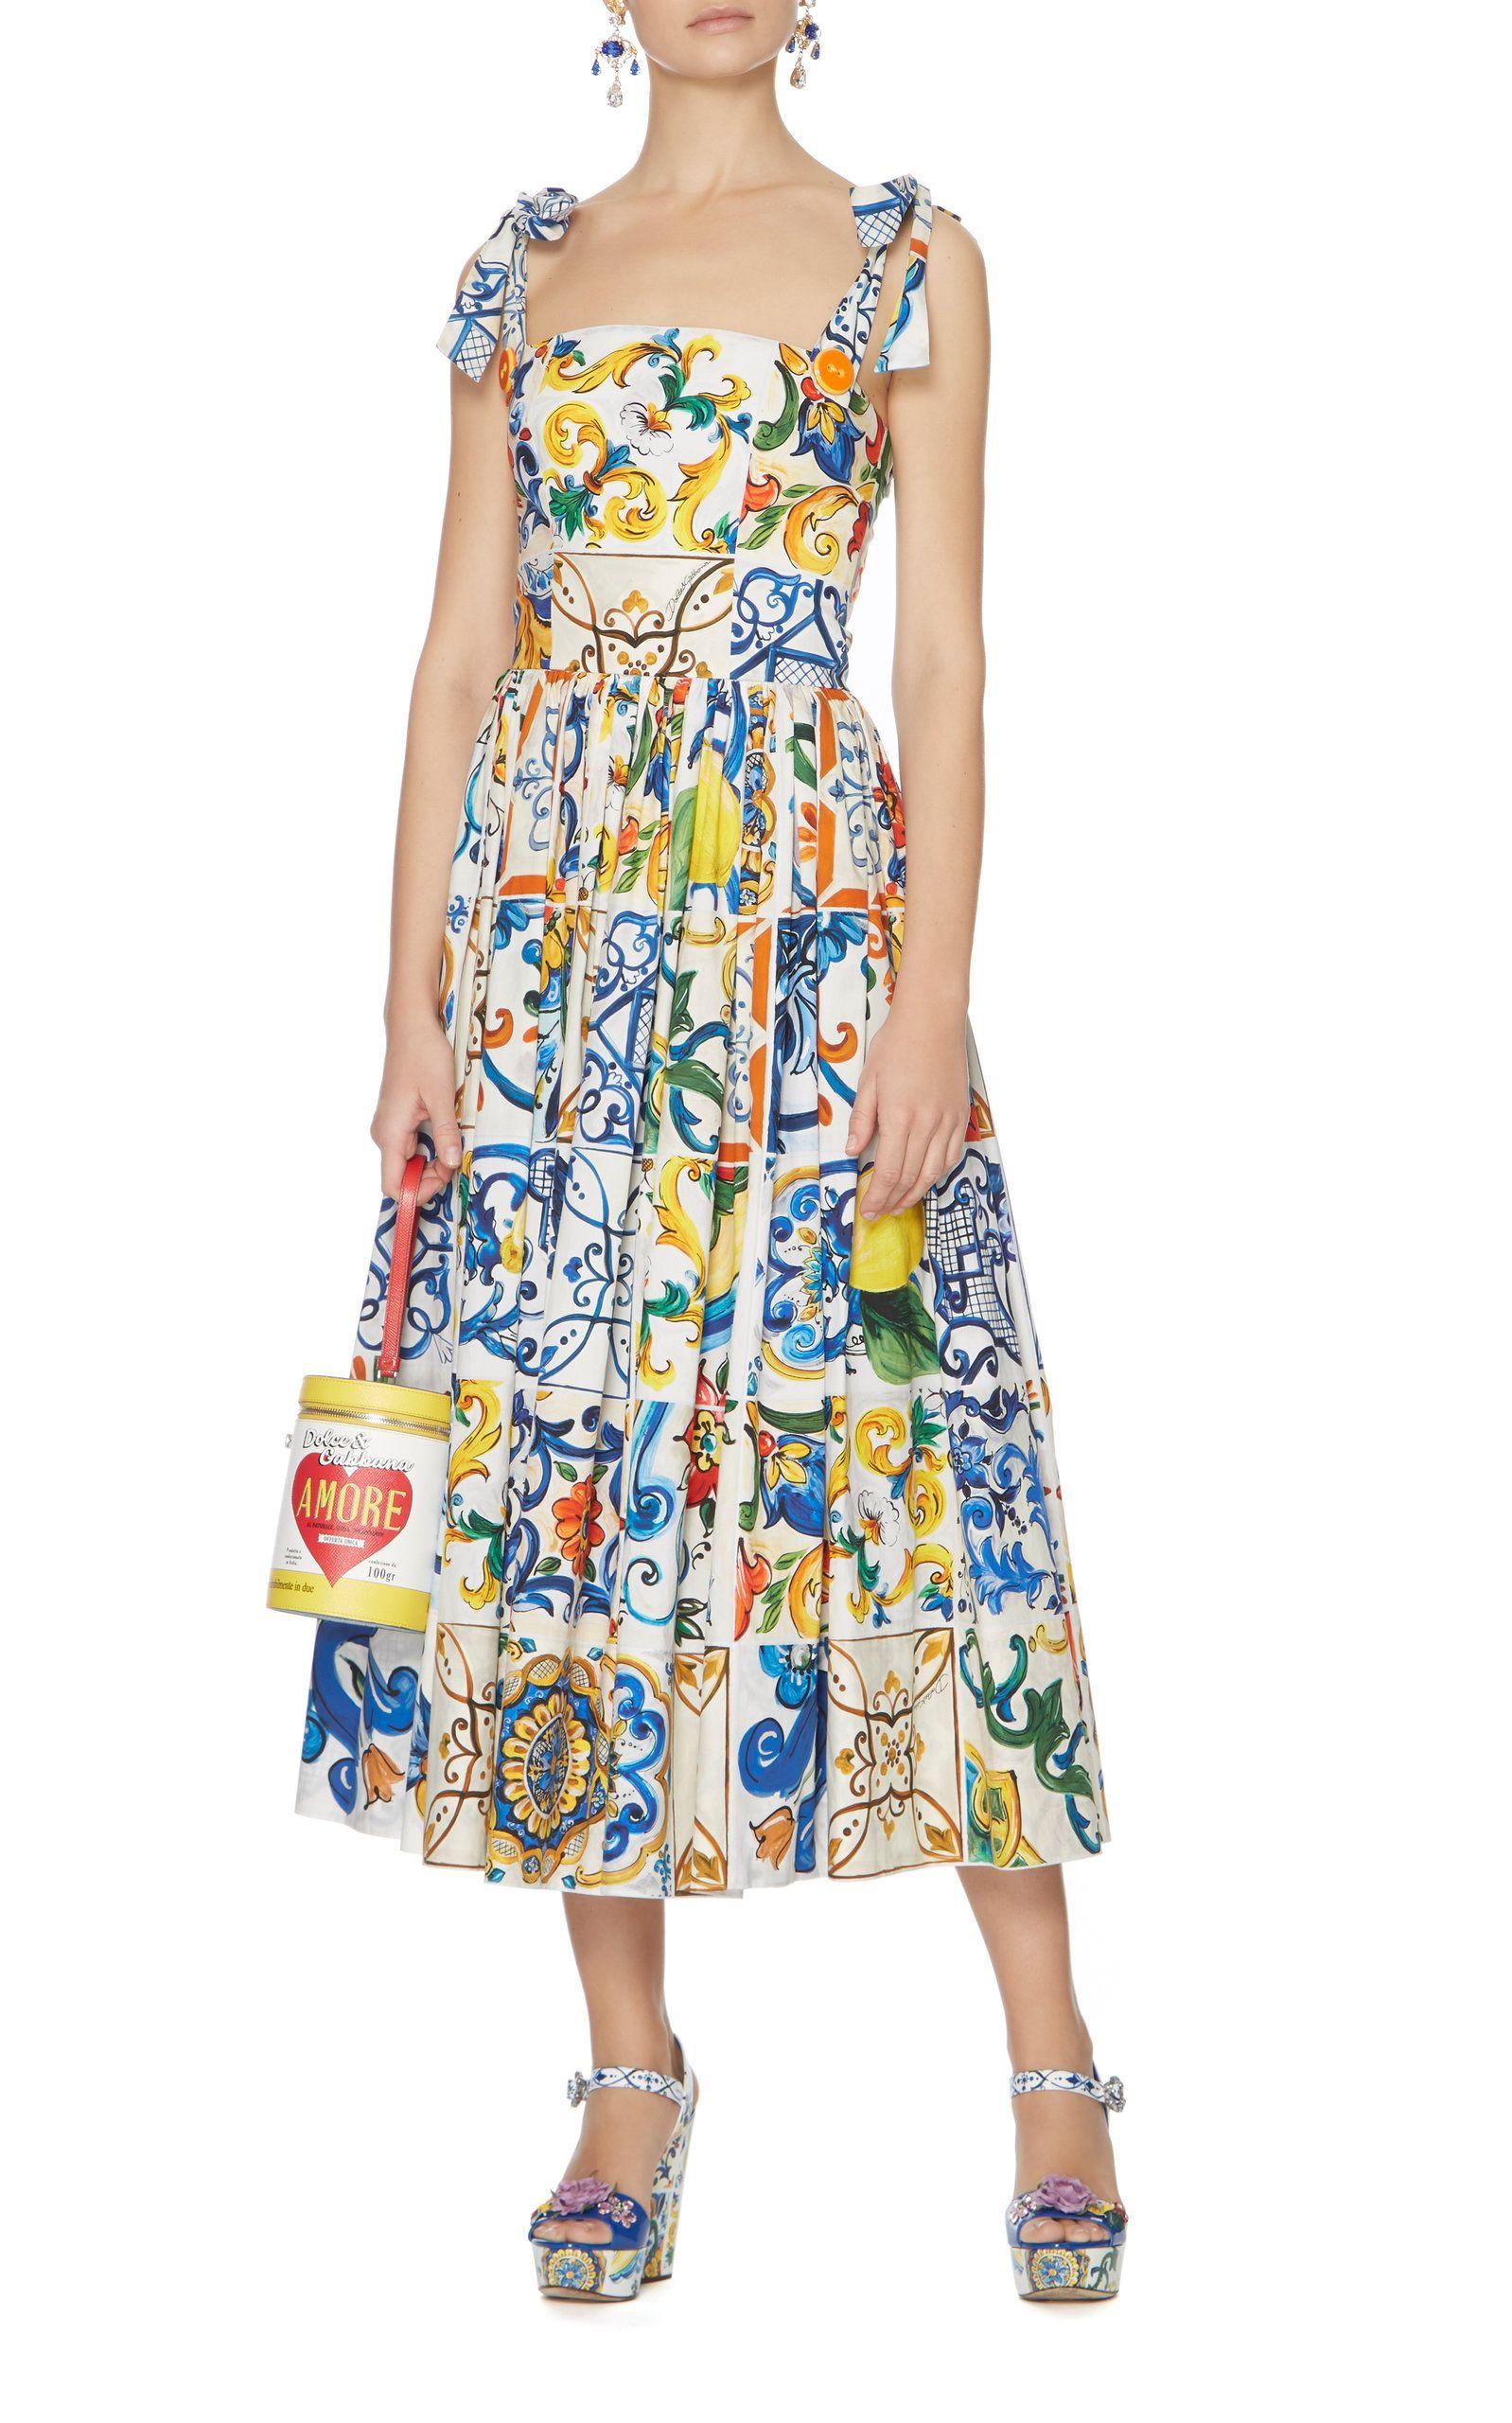 c30edf78b69190 ... Dolce   Gabbana Maiolica Tie Strap Tank Midi Dress. Click product to  zoom